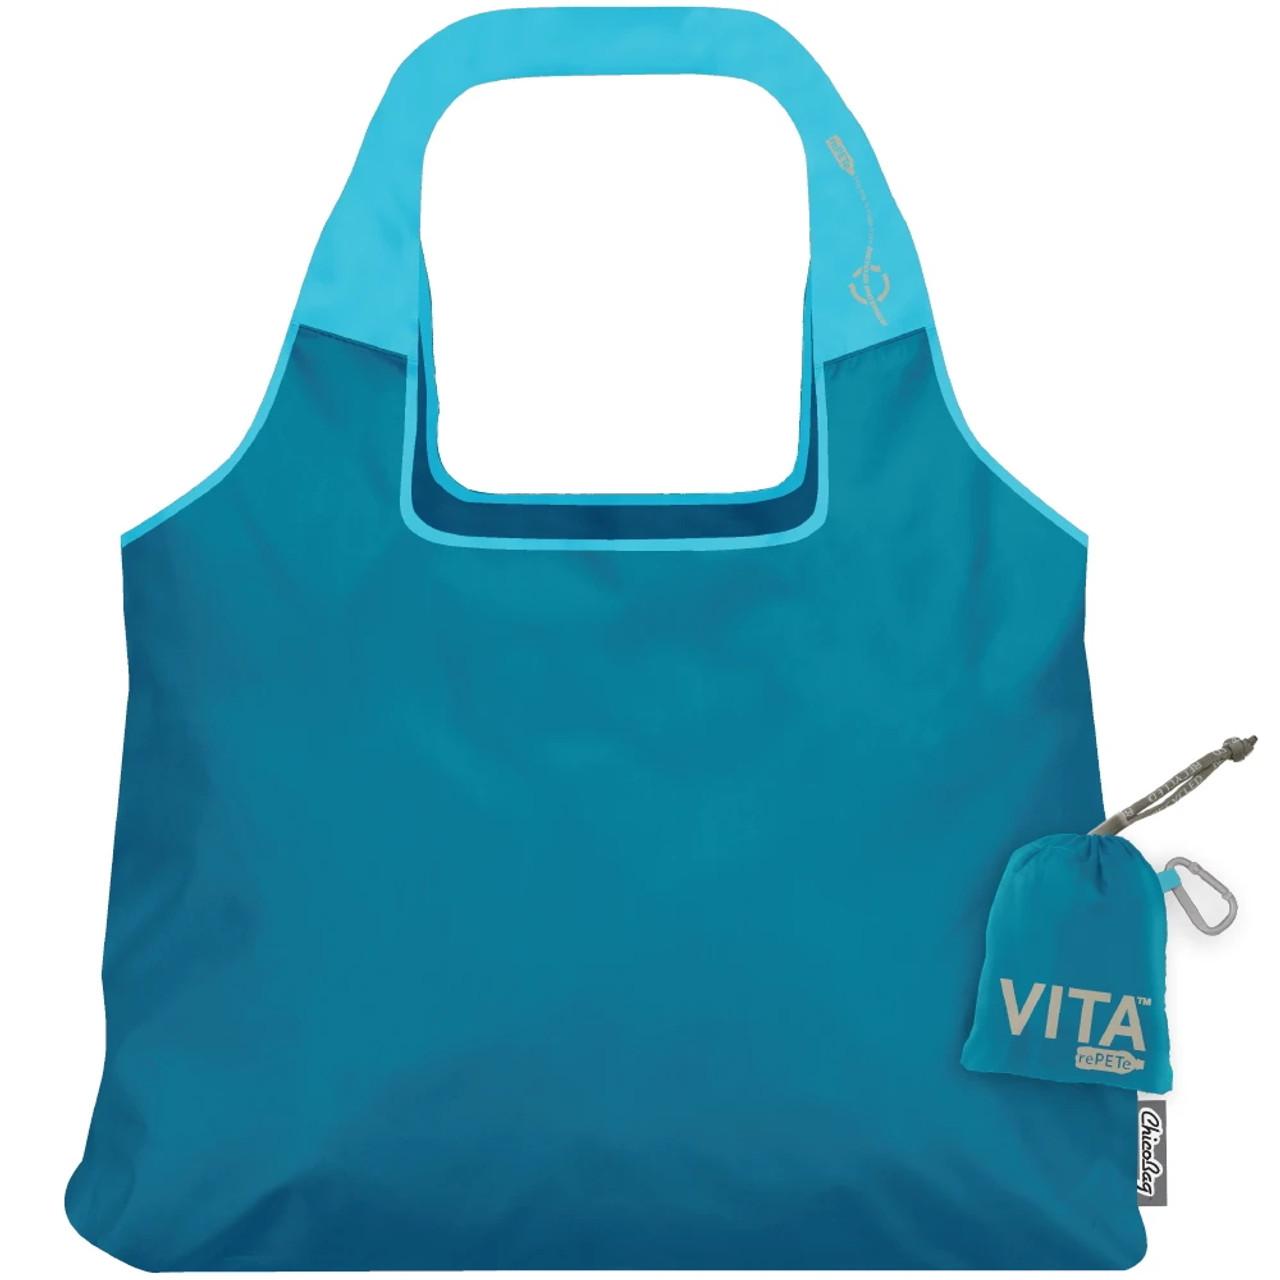 ChicoBag Vita rePETe Shoulder-Style Shopping Bag